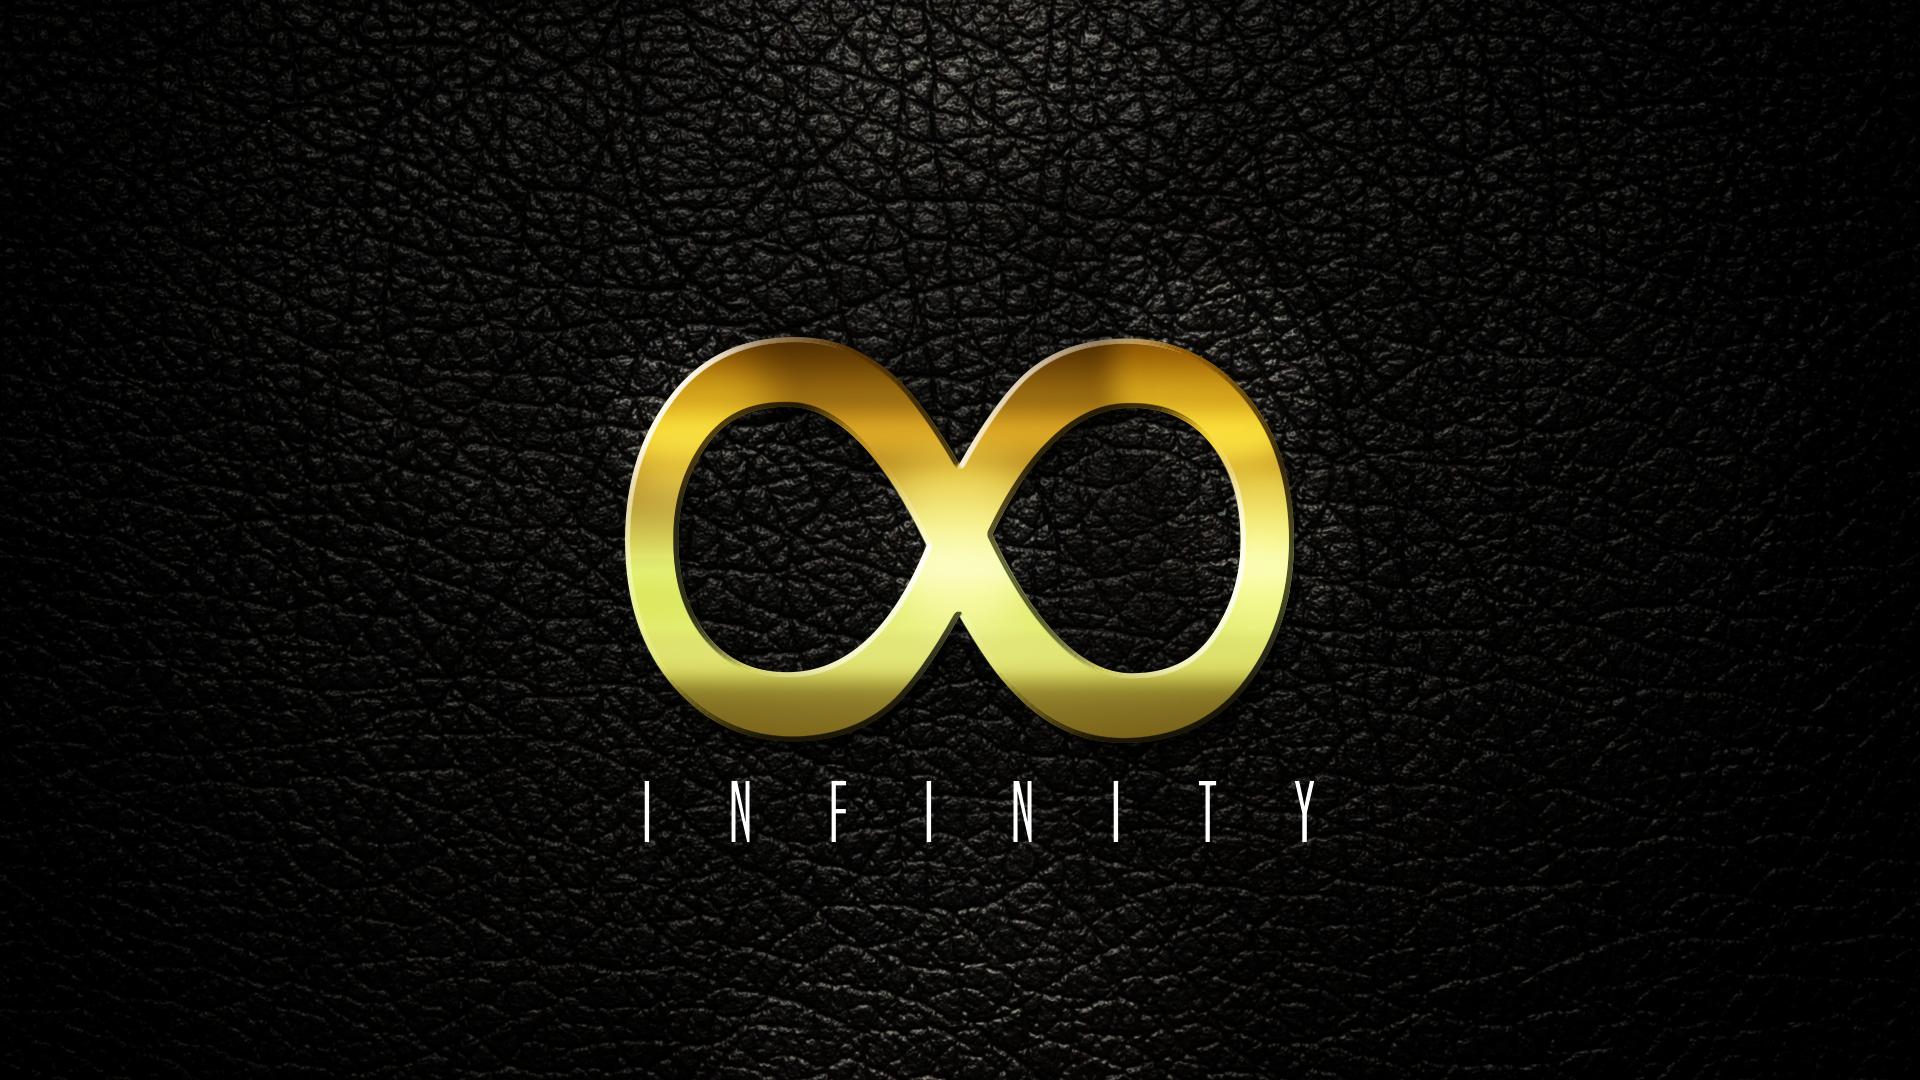 Infinity Wallpaper (63 Wallpapers) – HD Wallpapers